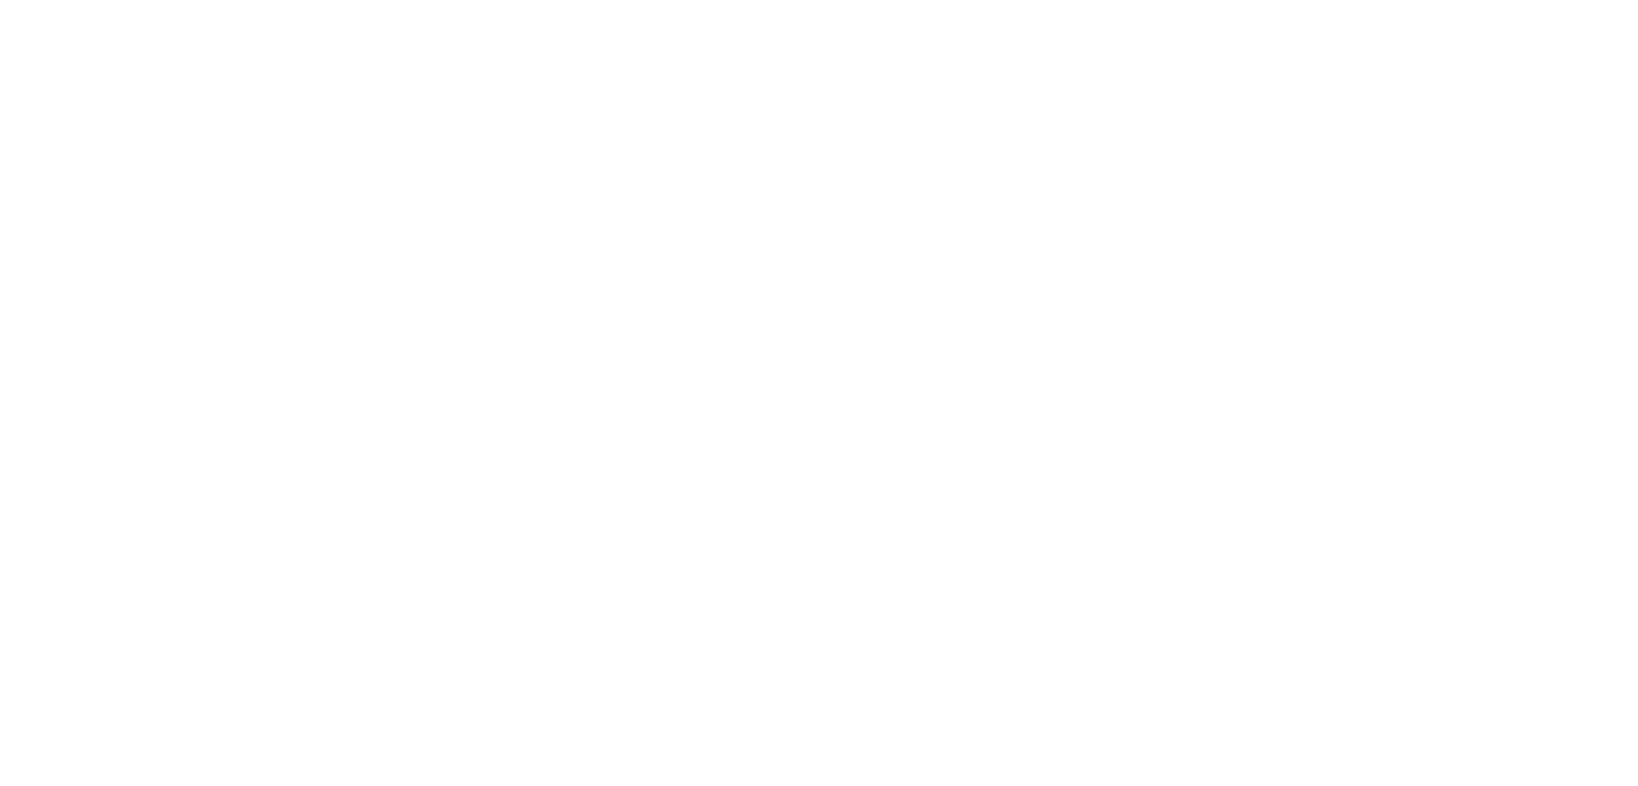 logotipo-maria-eugenia-wilmers-psiquiatra-branco